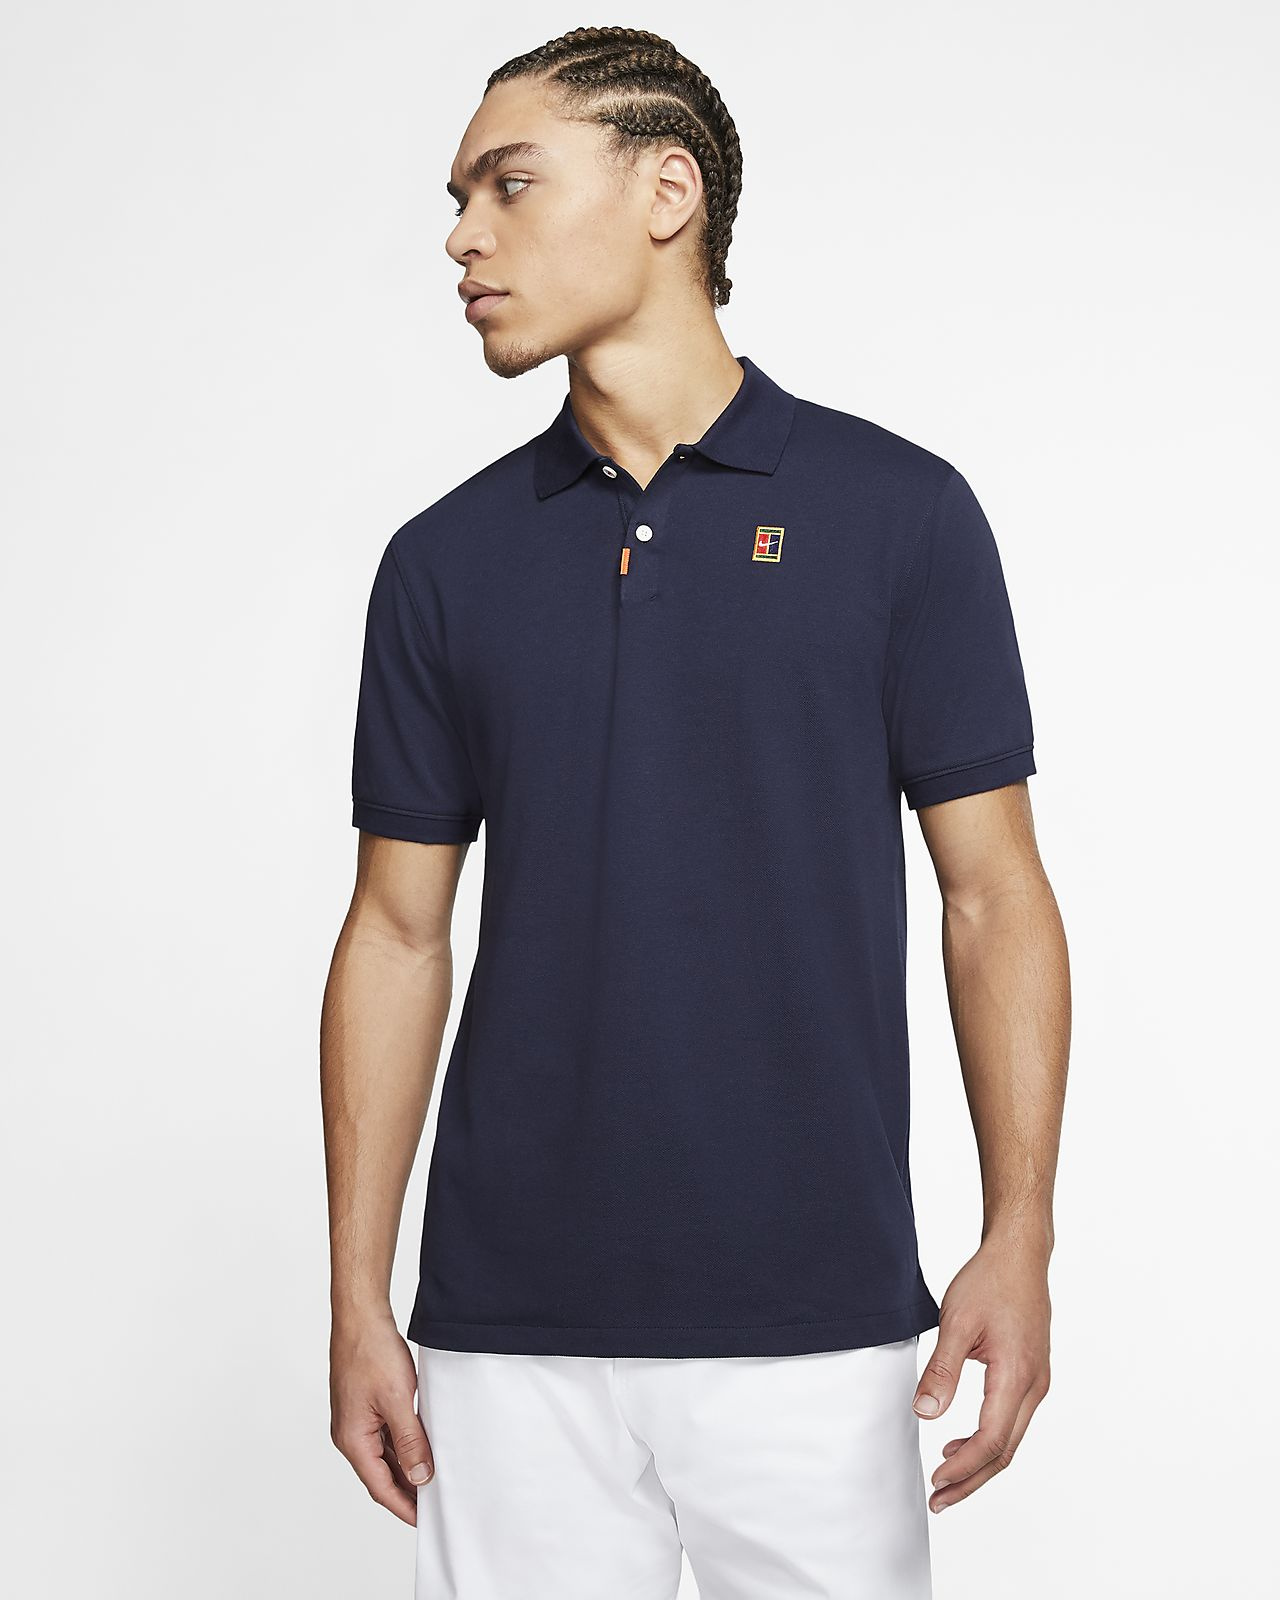 The Nike Polo Herren-Poloshirt in schmaler Passform